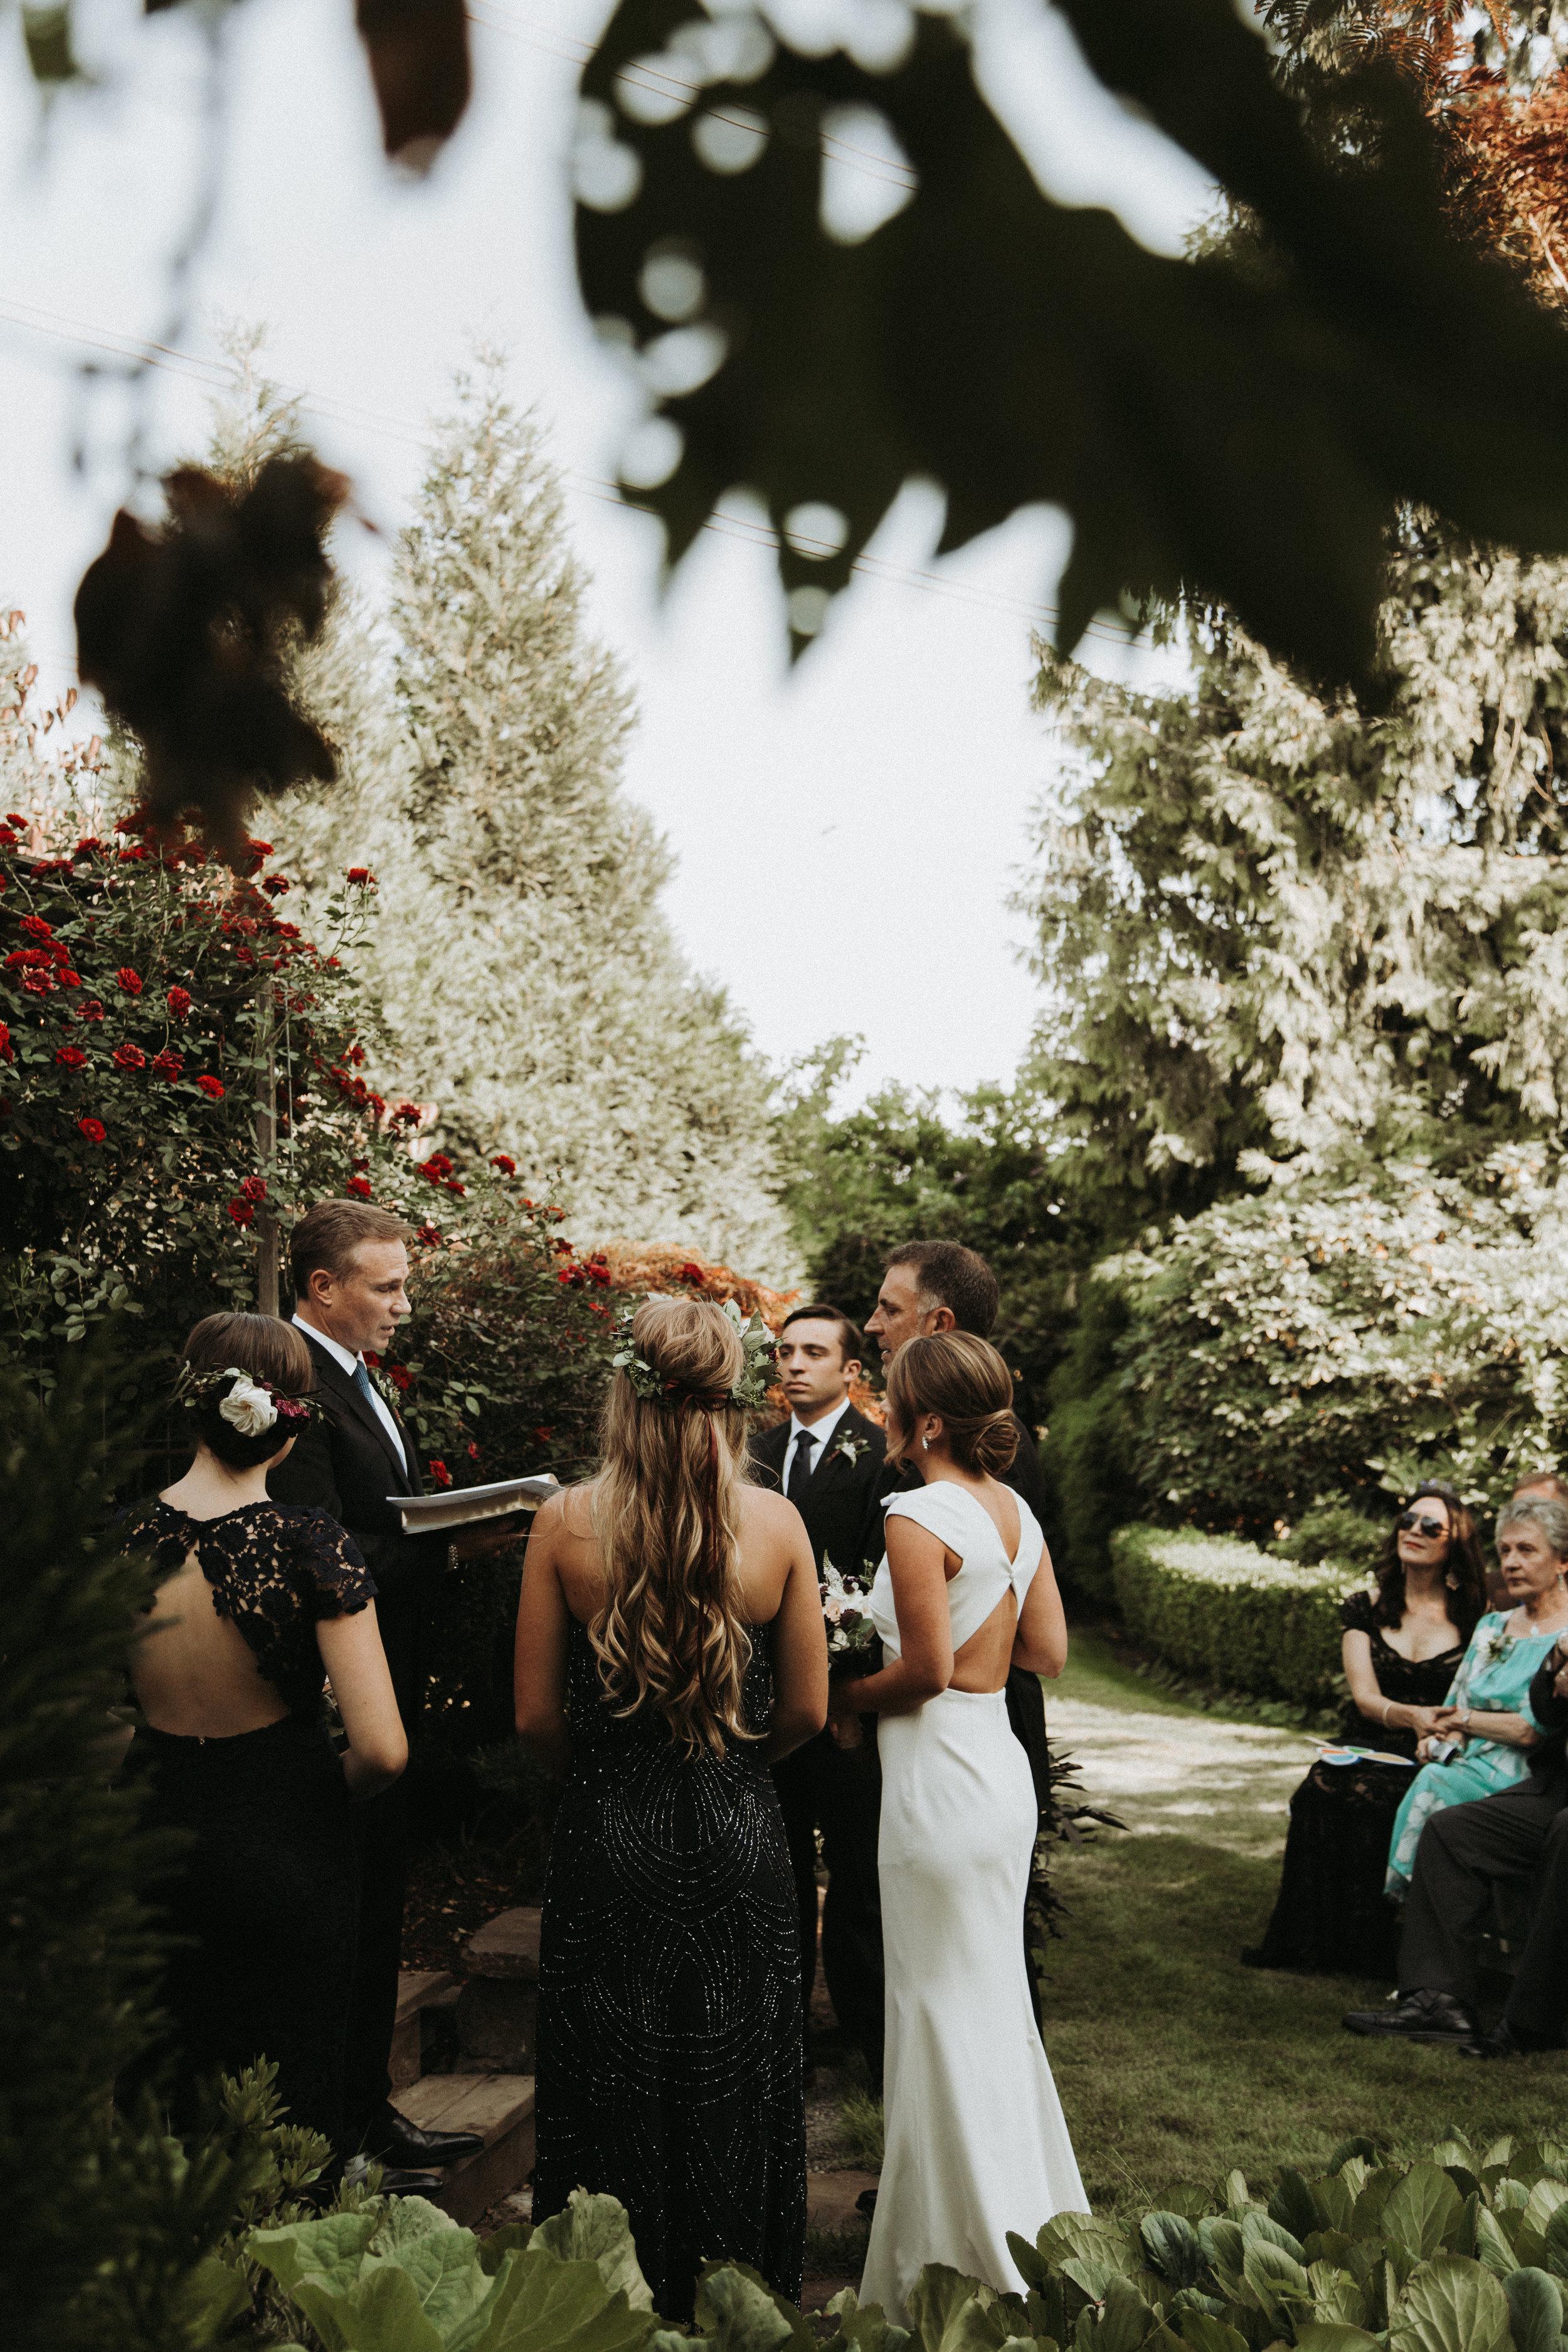 PORTLAND INTIMATE BACKYARD WEDDING_JENNY CHOKBENGBOUN PHOTO-244.JPG